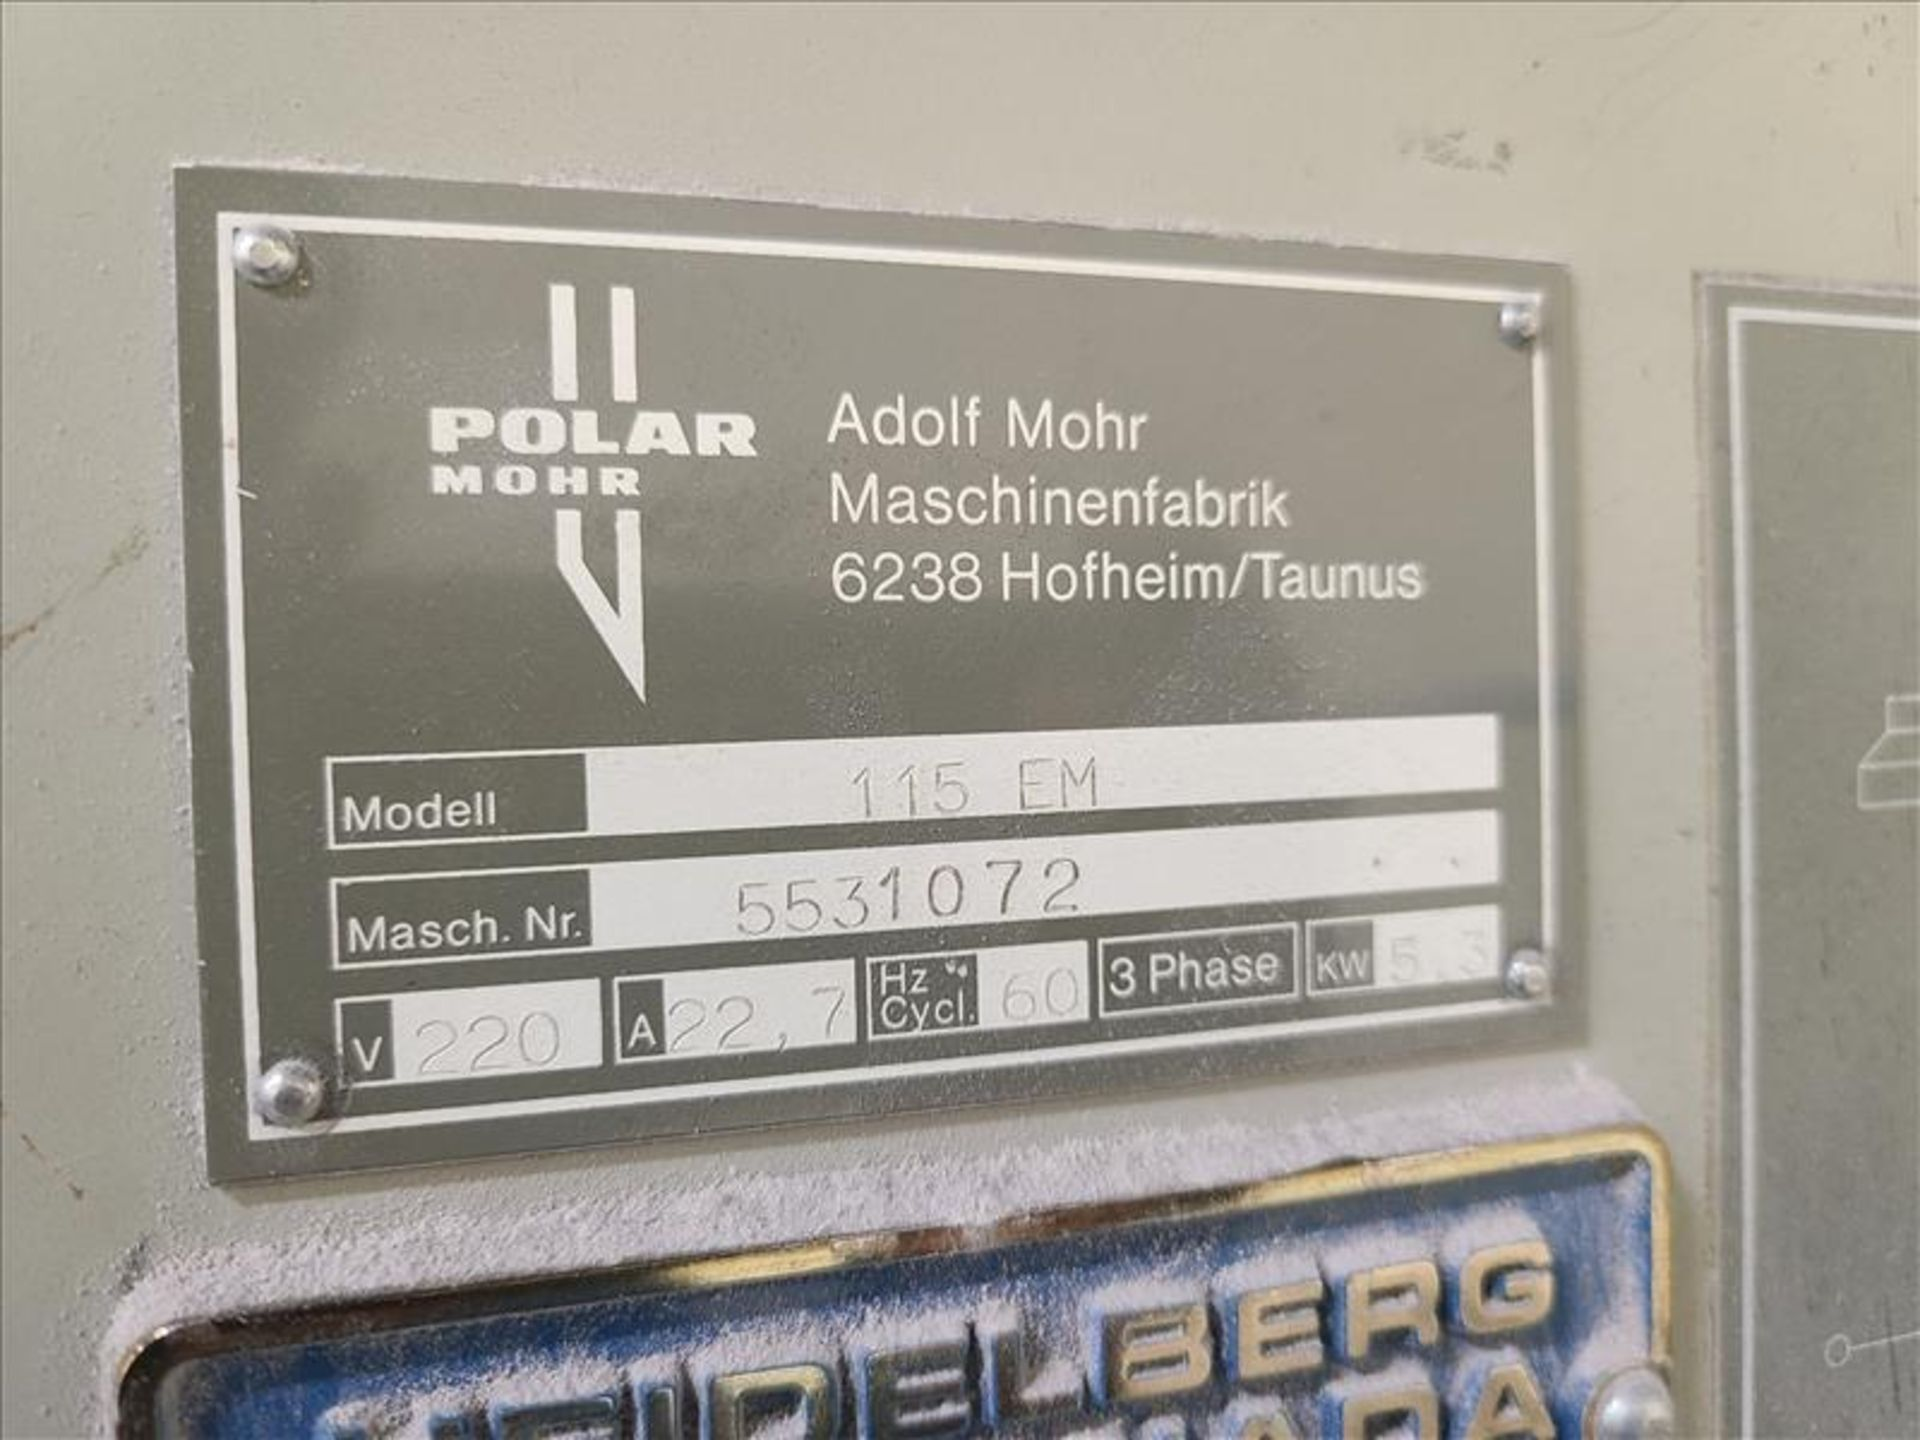 Polar Mohr Guillotine, model 115 EM, S/N. 5531072 (1985) w/4' infeed, 220V, 22.7 amps, 3 Phase - Image 3 of 3